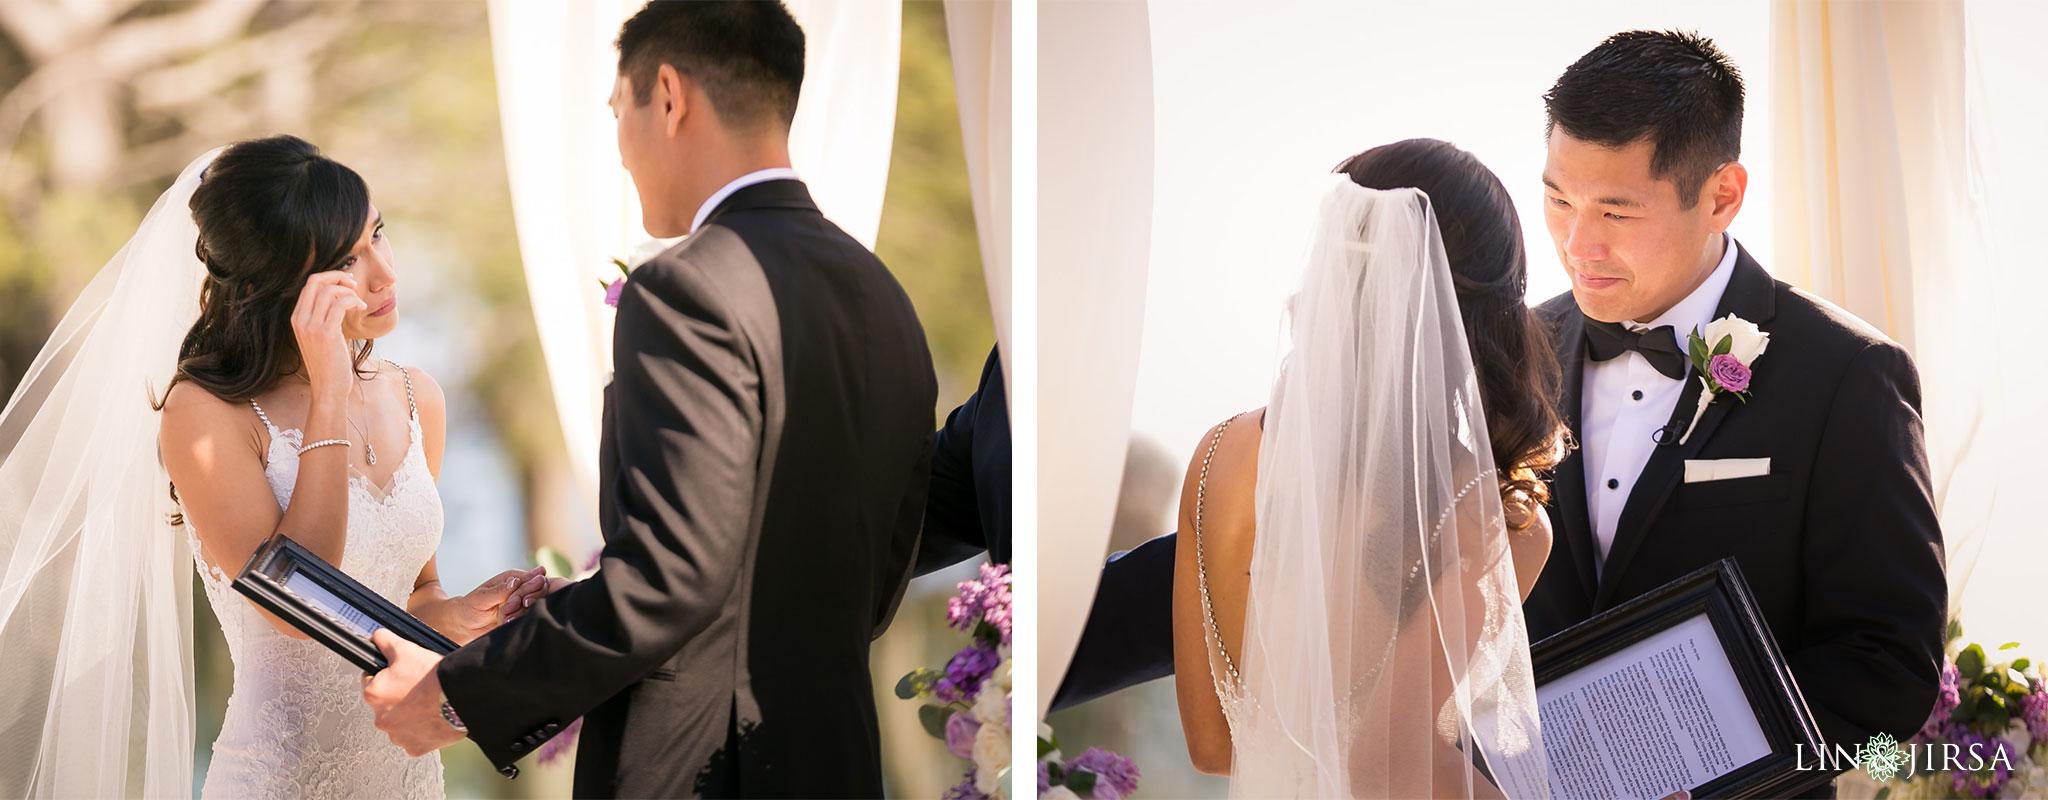 23 laguna cliffs marriott dana point wedding ceremony photography